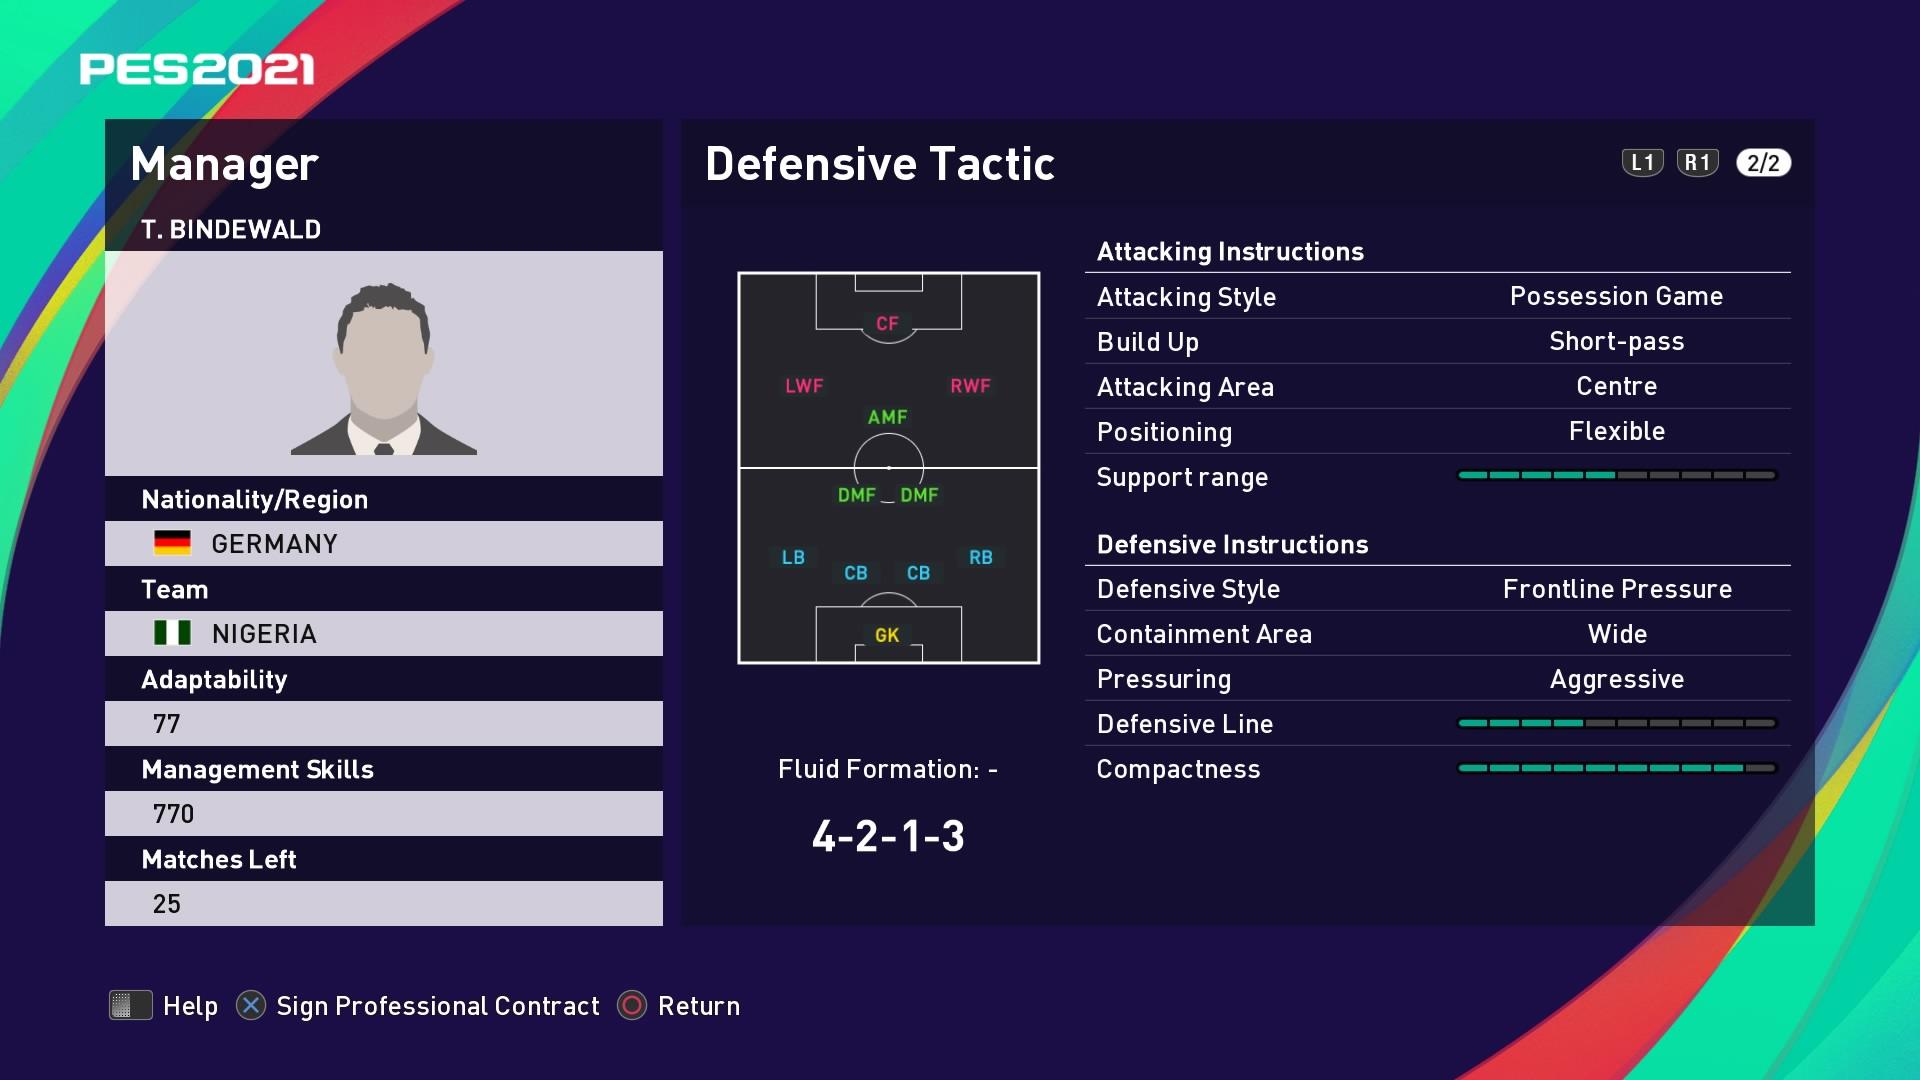 T. Bindewald (Gernot Rohr) Defensive Tactic in PES 2021 myClub